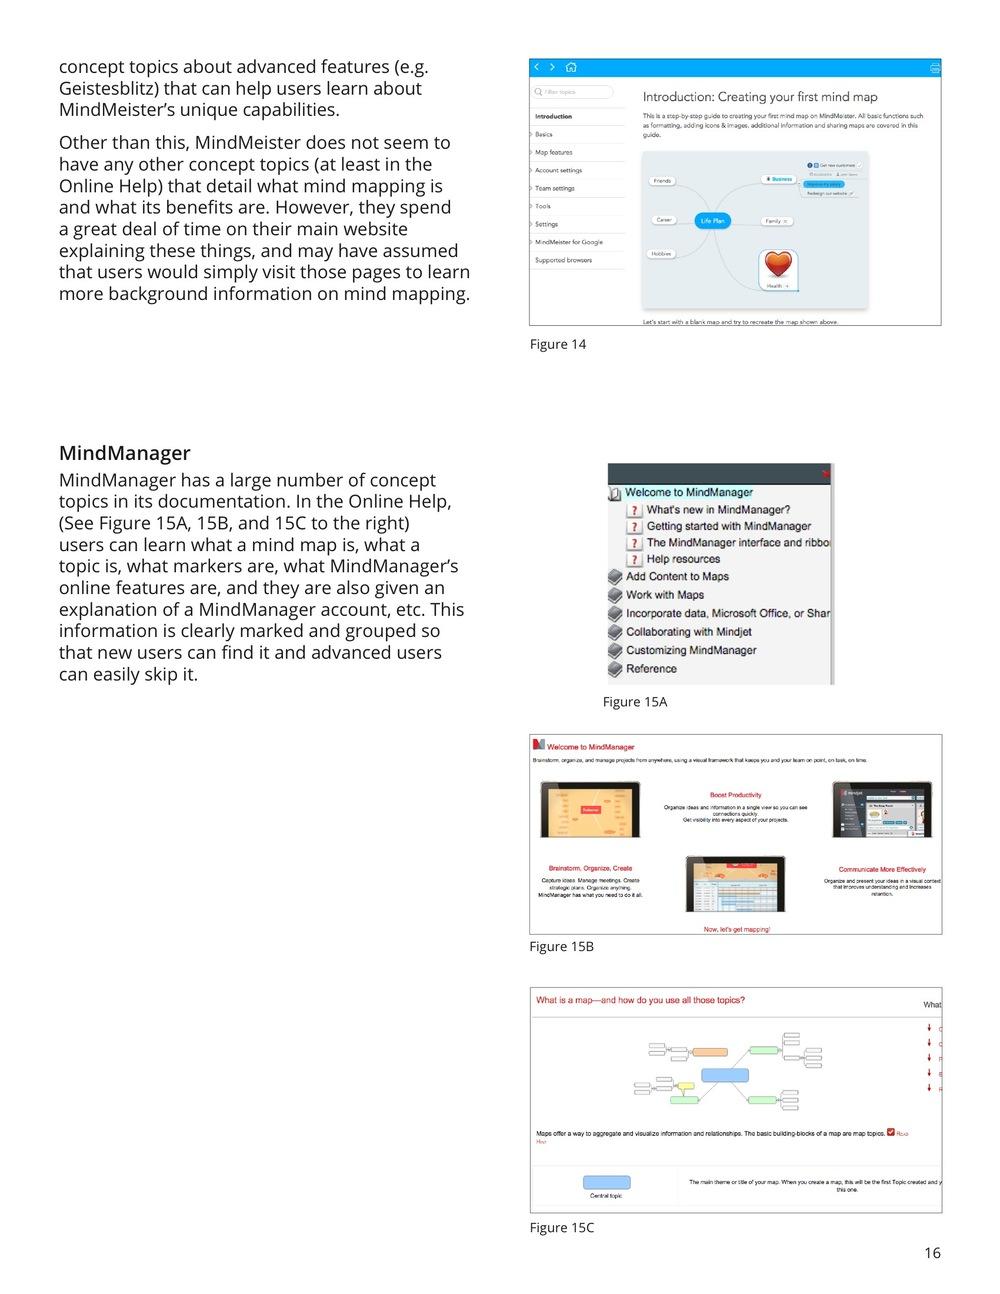 XMind Final Report_4-23-15 16-16.jpeg